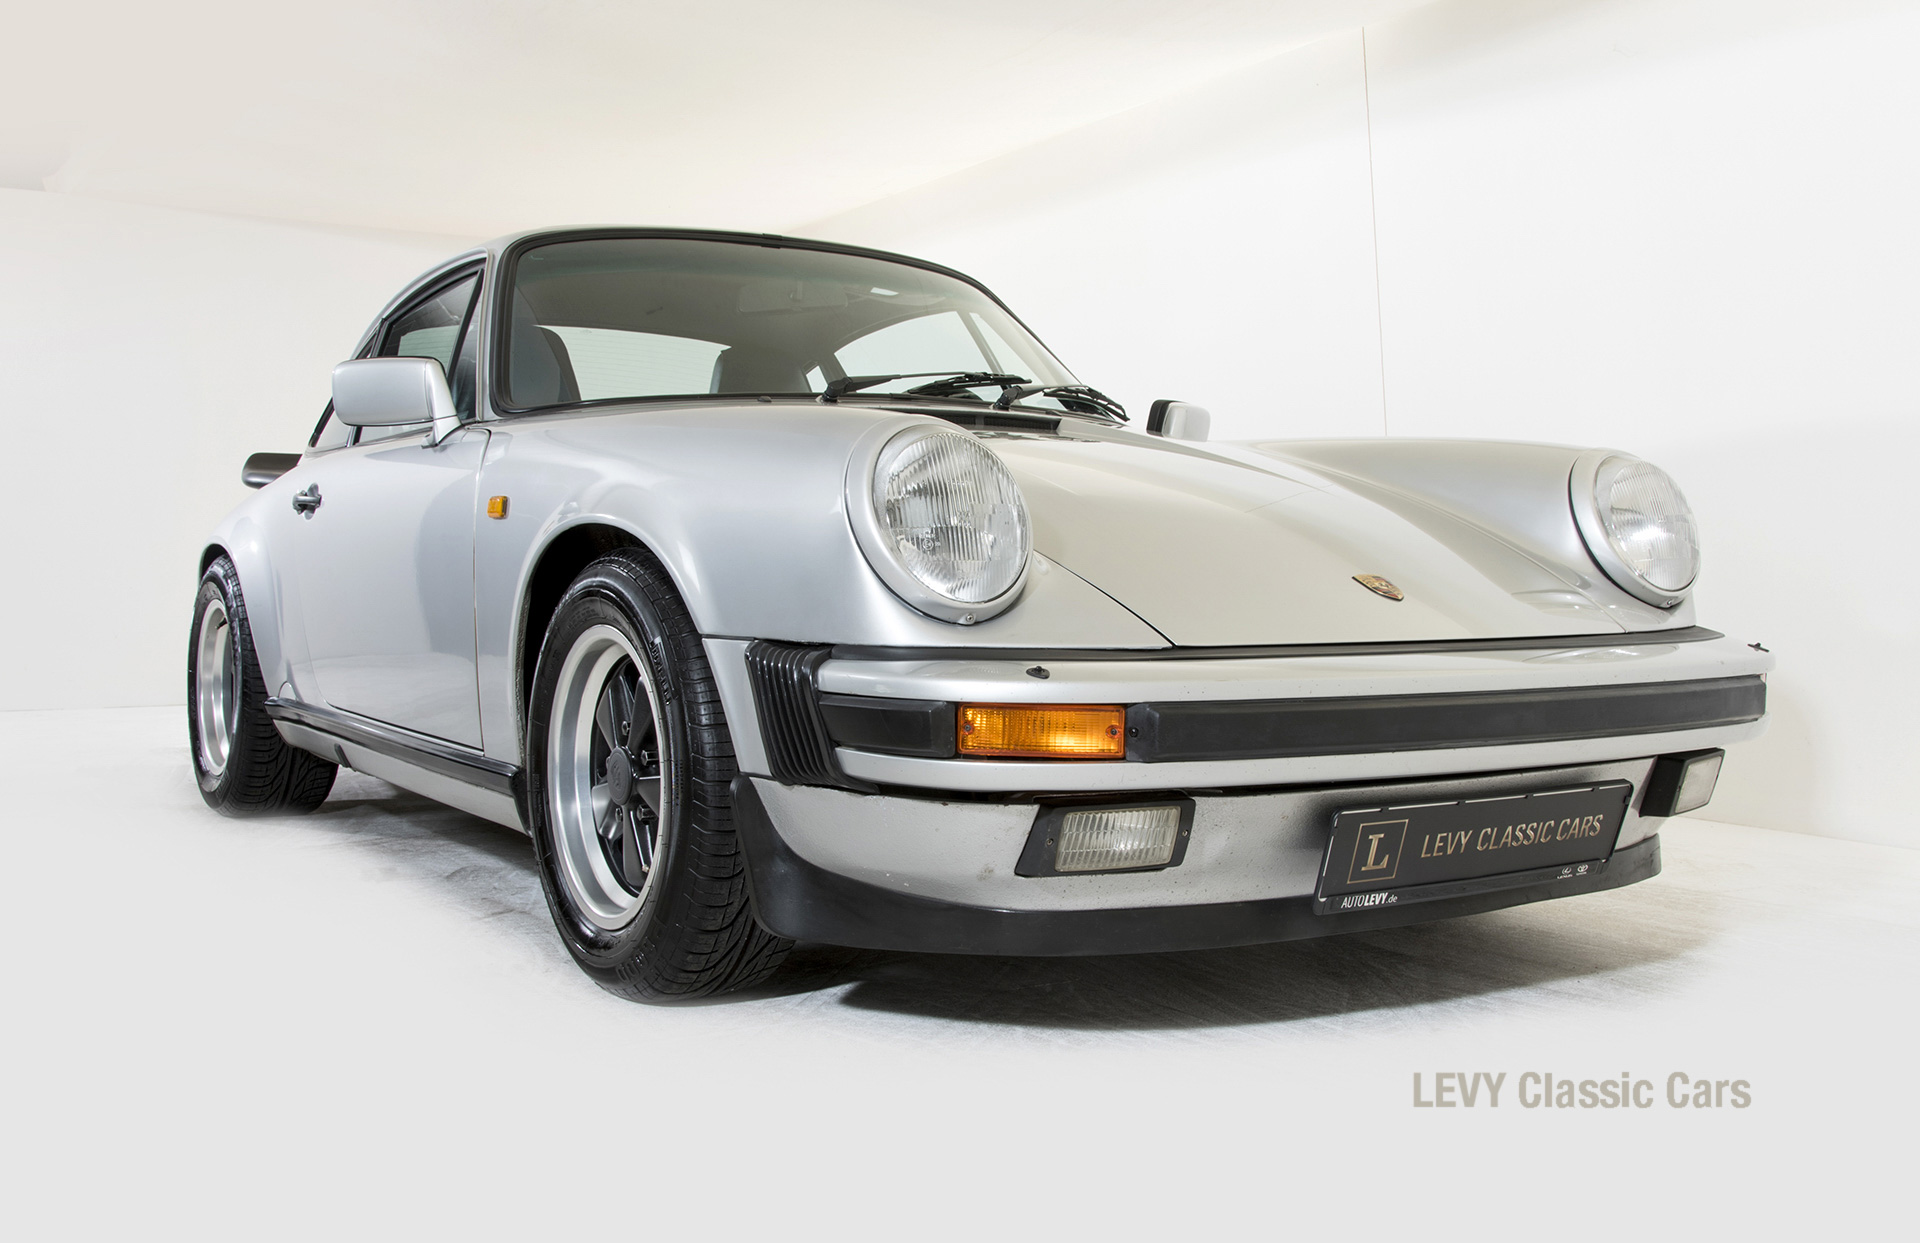 Porsche 911 C silber 03809 06